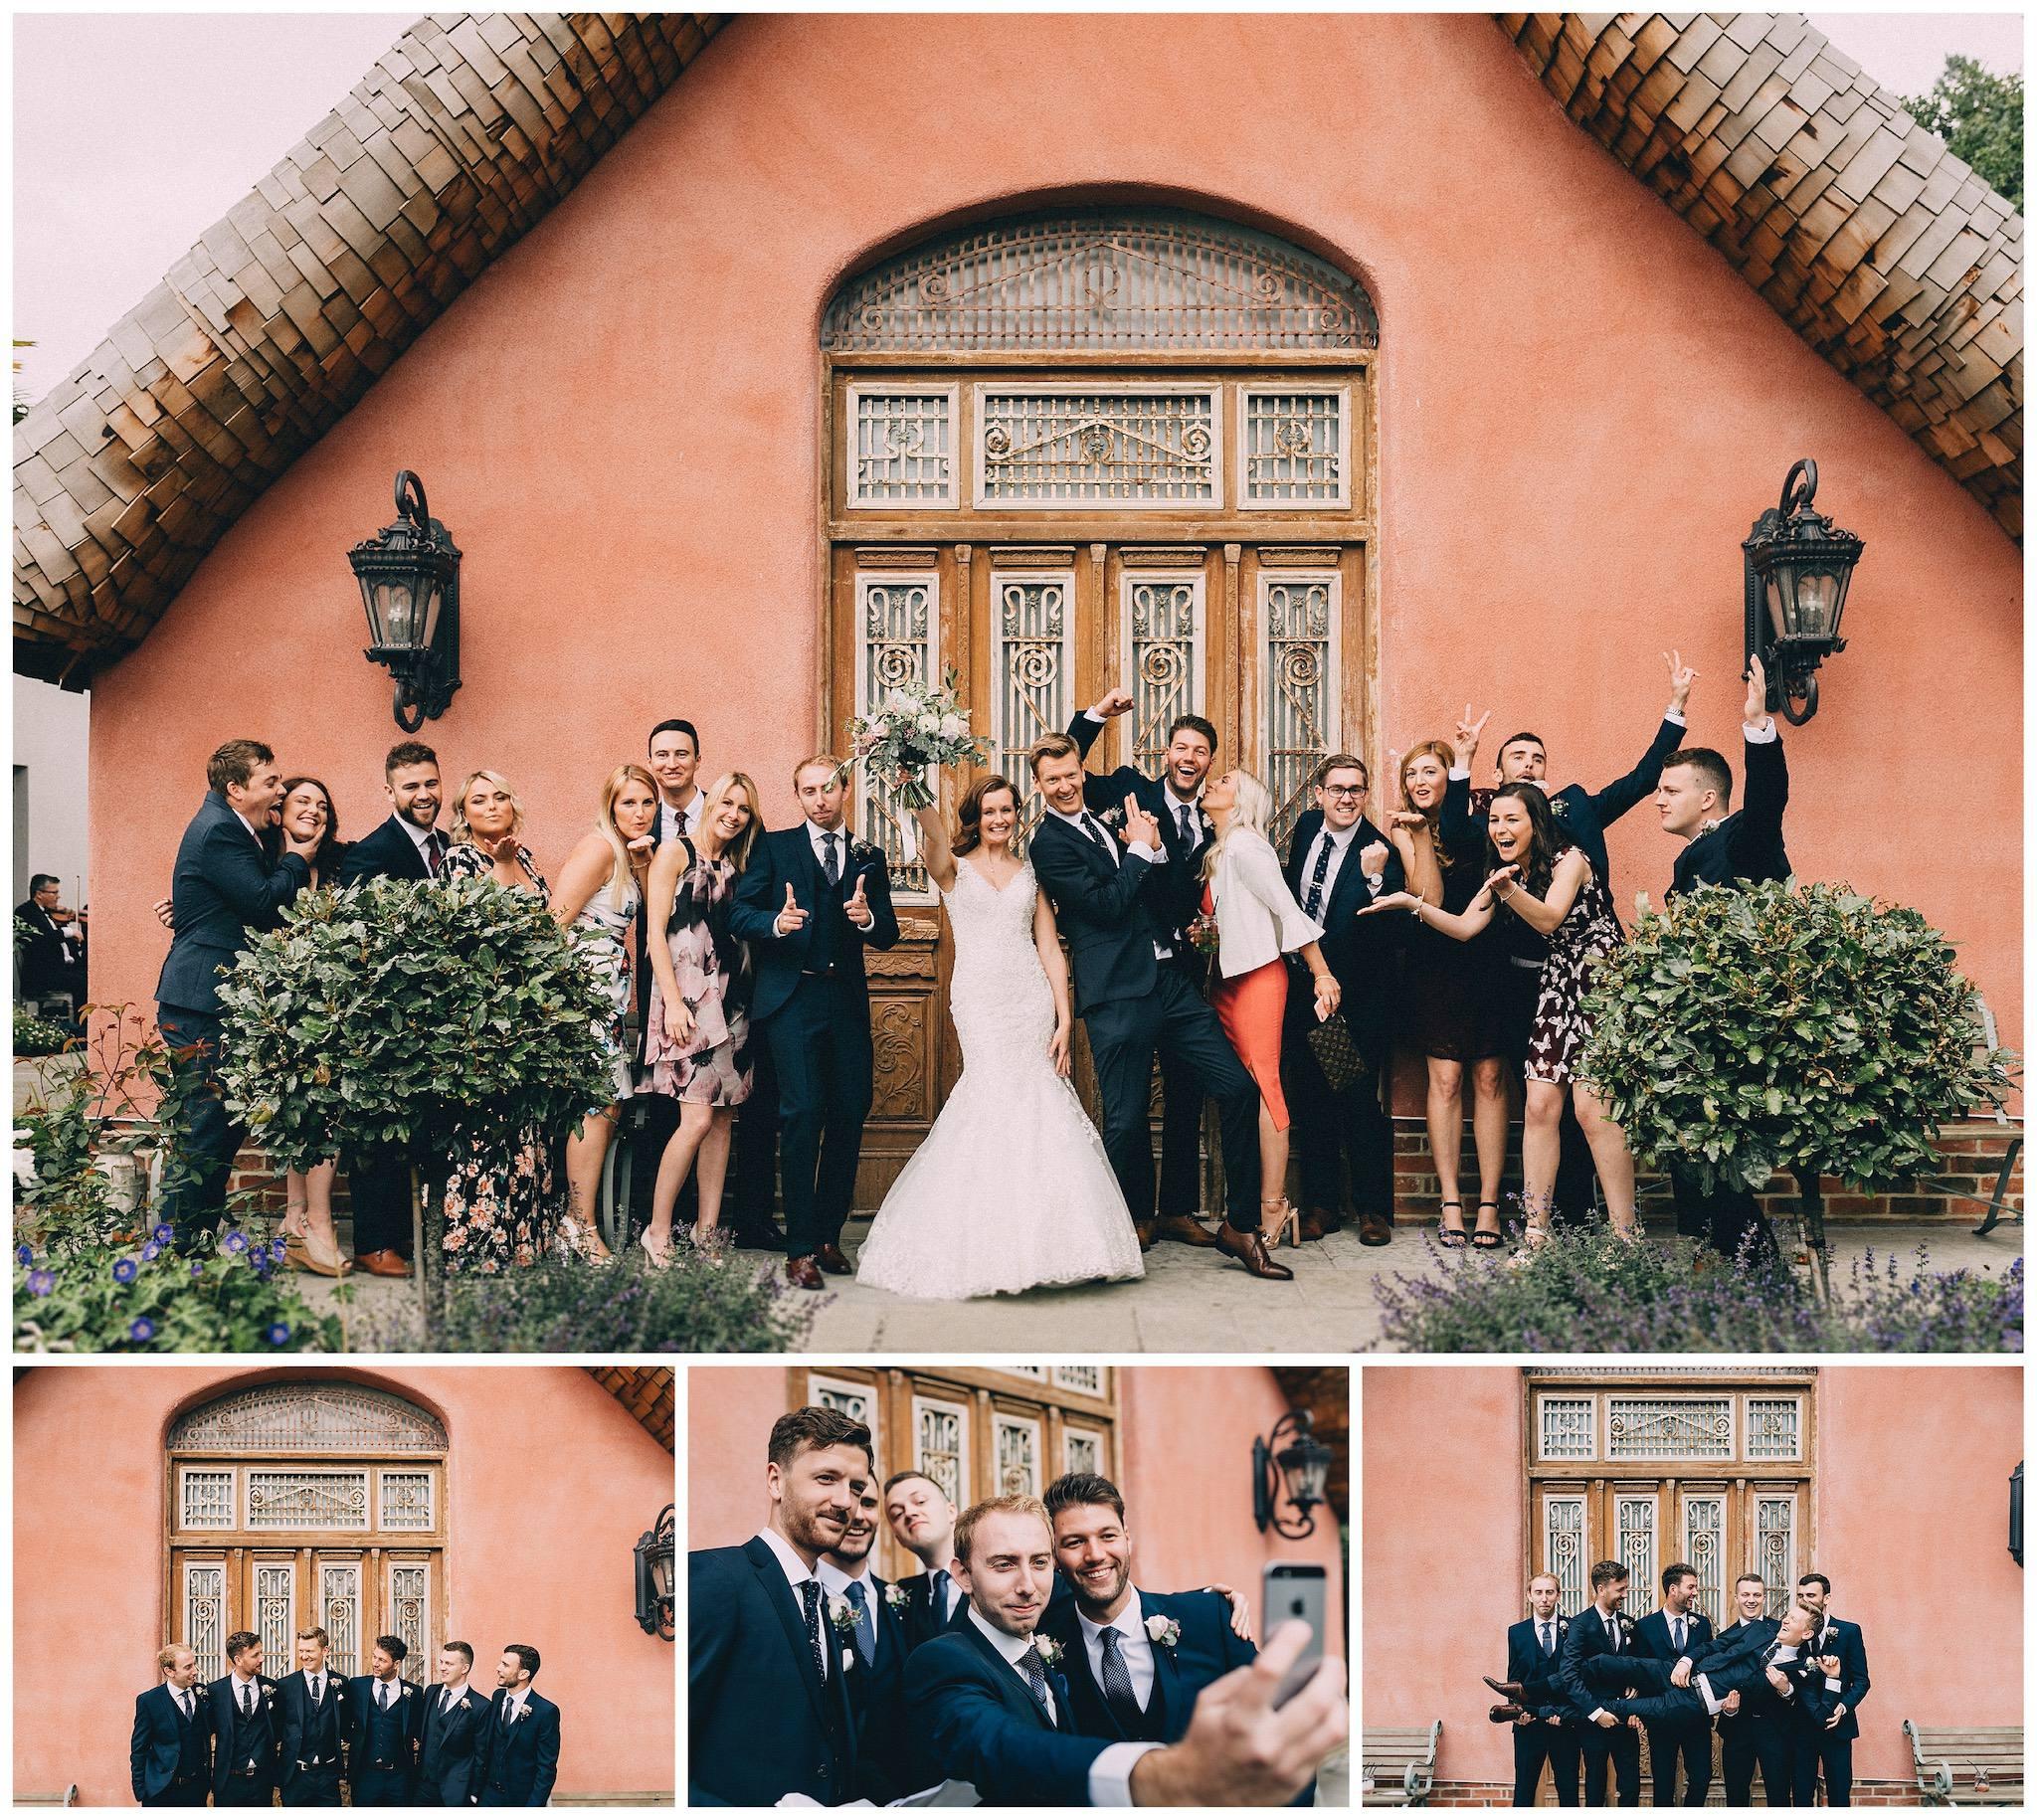 Le-Petit-Chateau-Wedding-Photographer-11.jpg